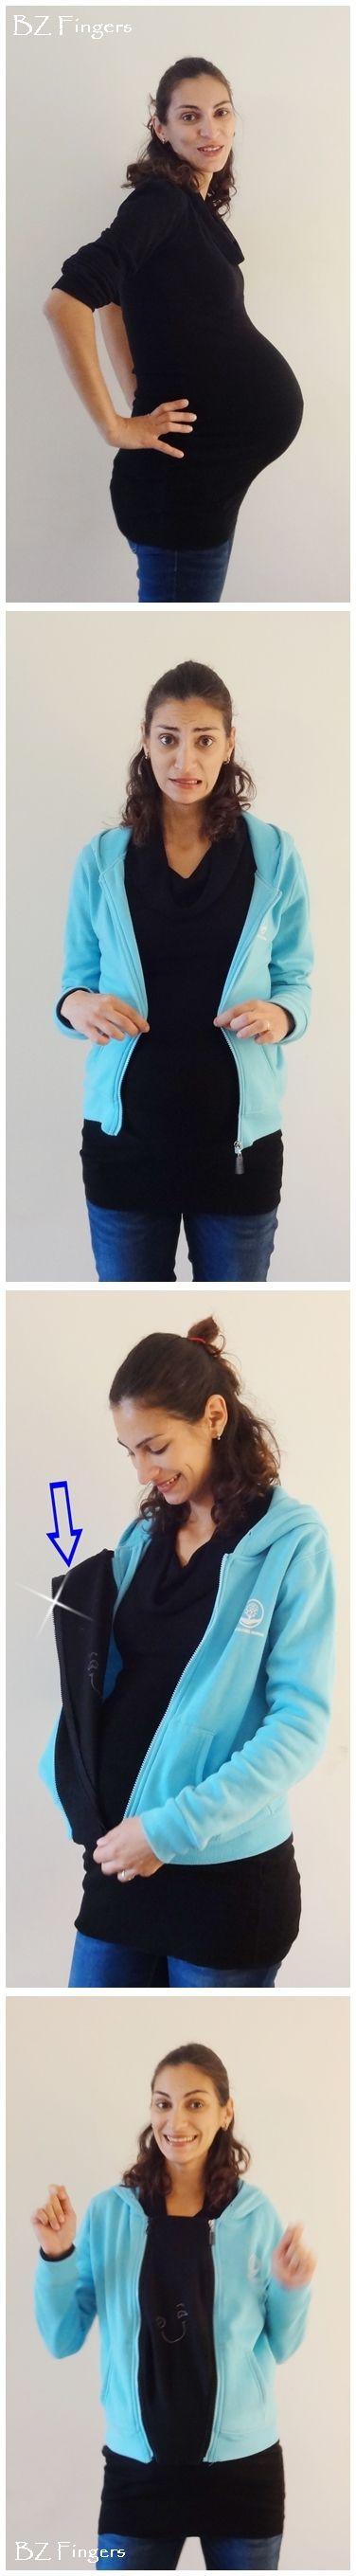 Universal #Pregnancy #Maternity Jacket Insert https://www.etsy.com/shop/BZfingers